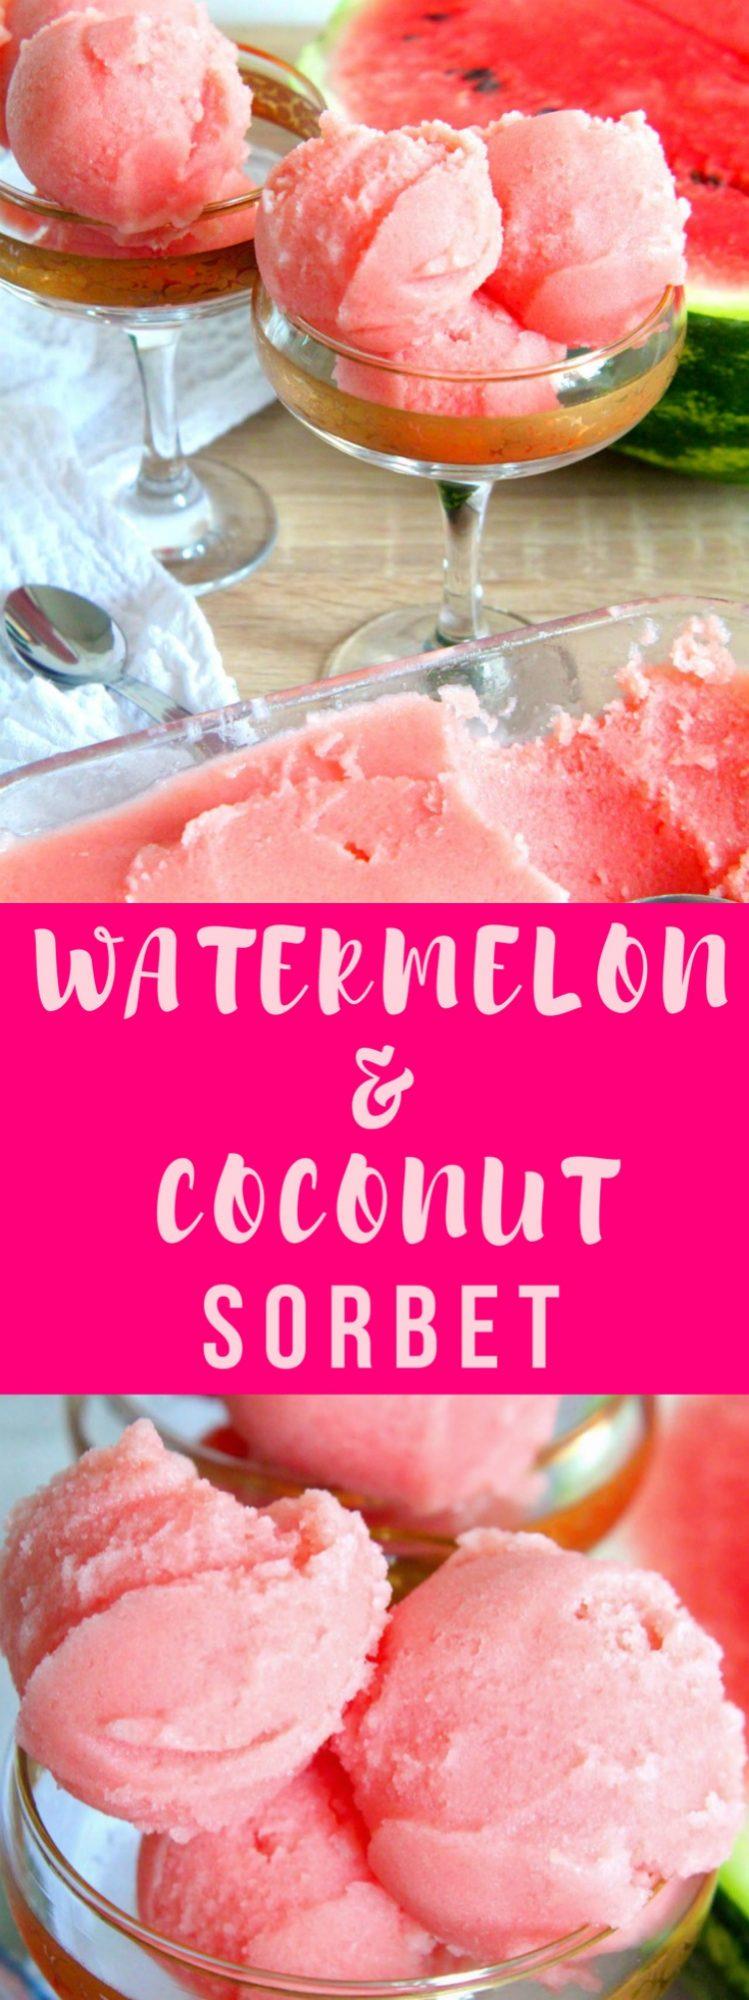 Watermelon sorbet